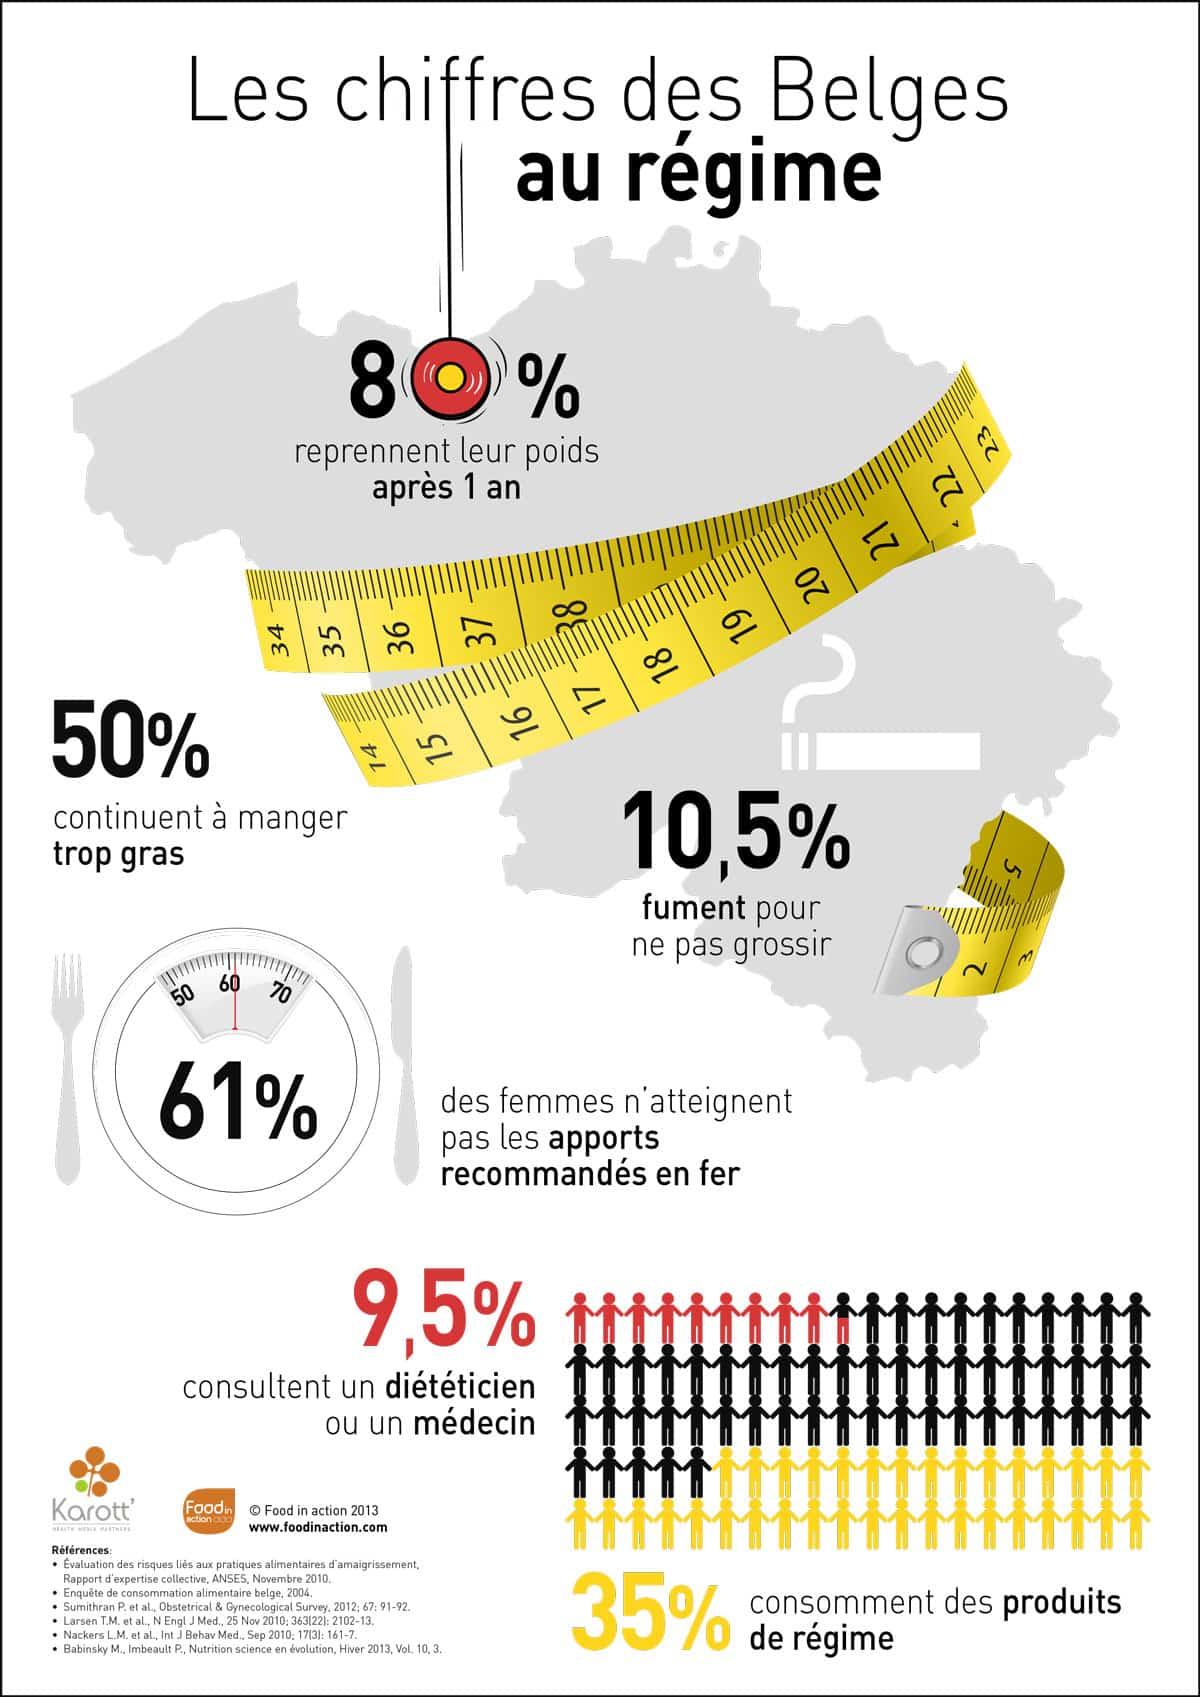 nutrigraphics-chiffres-belges-regime